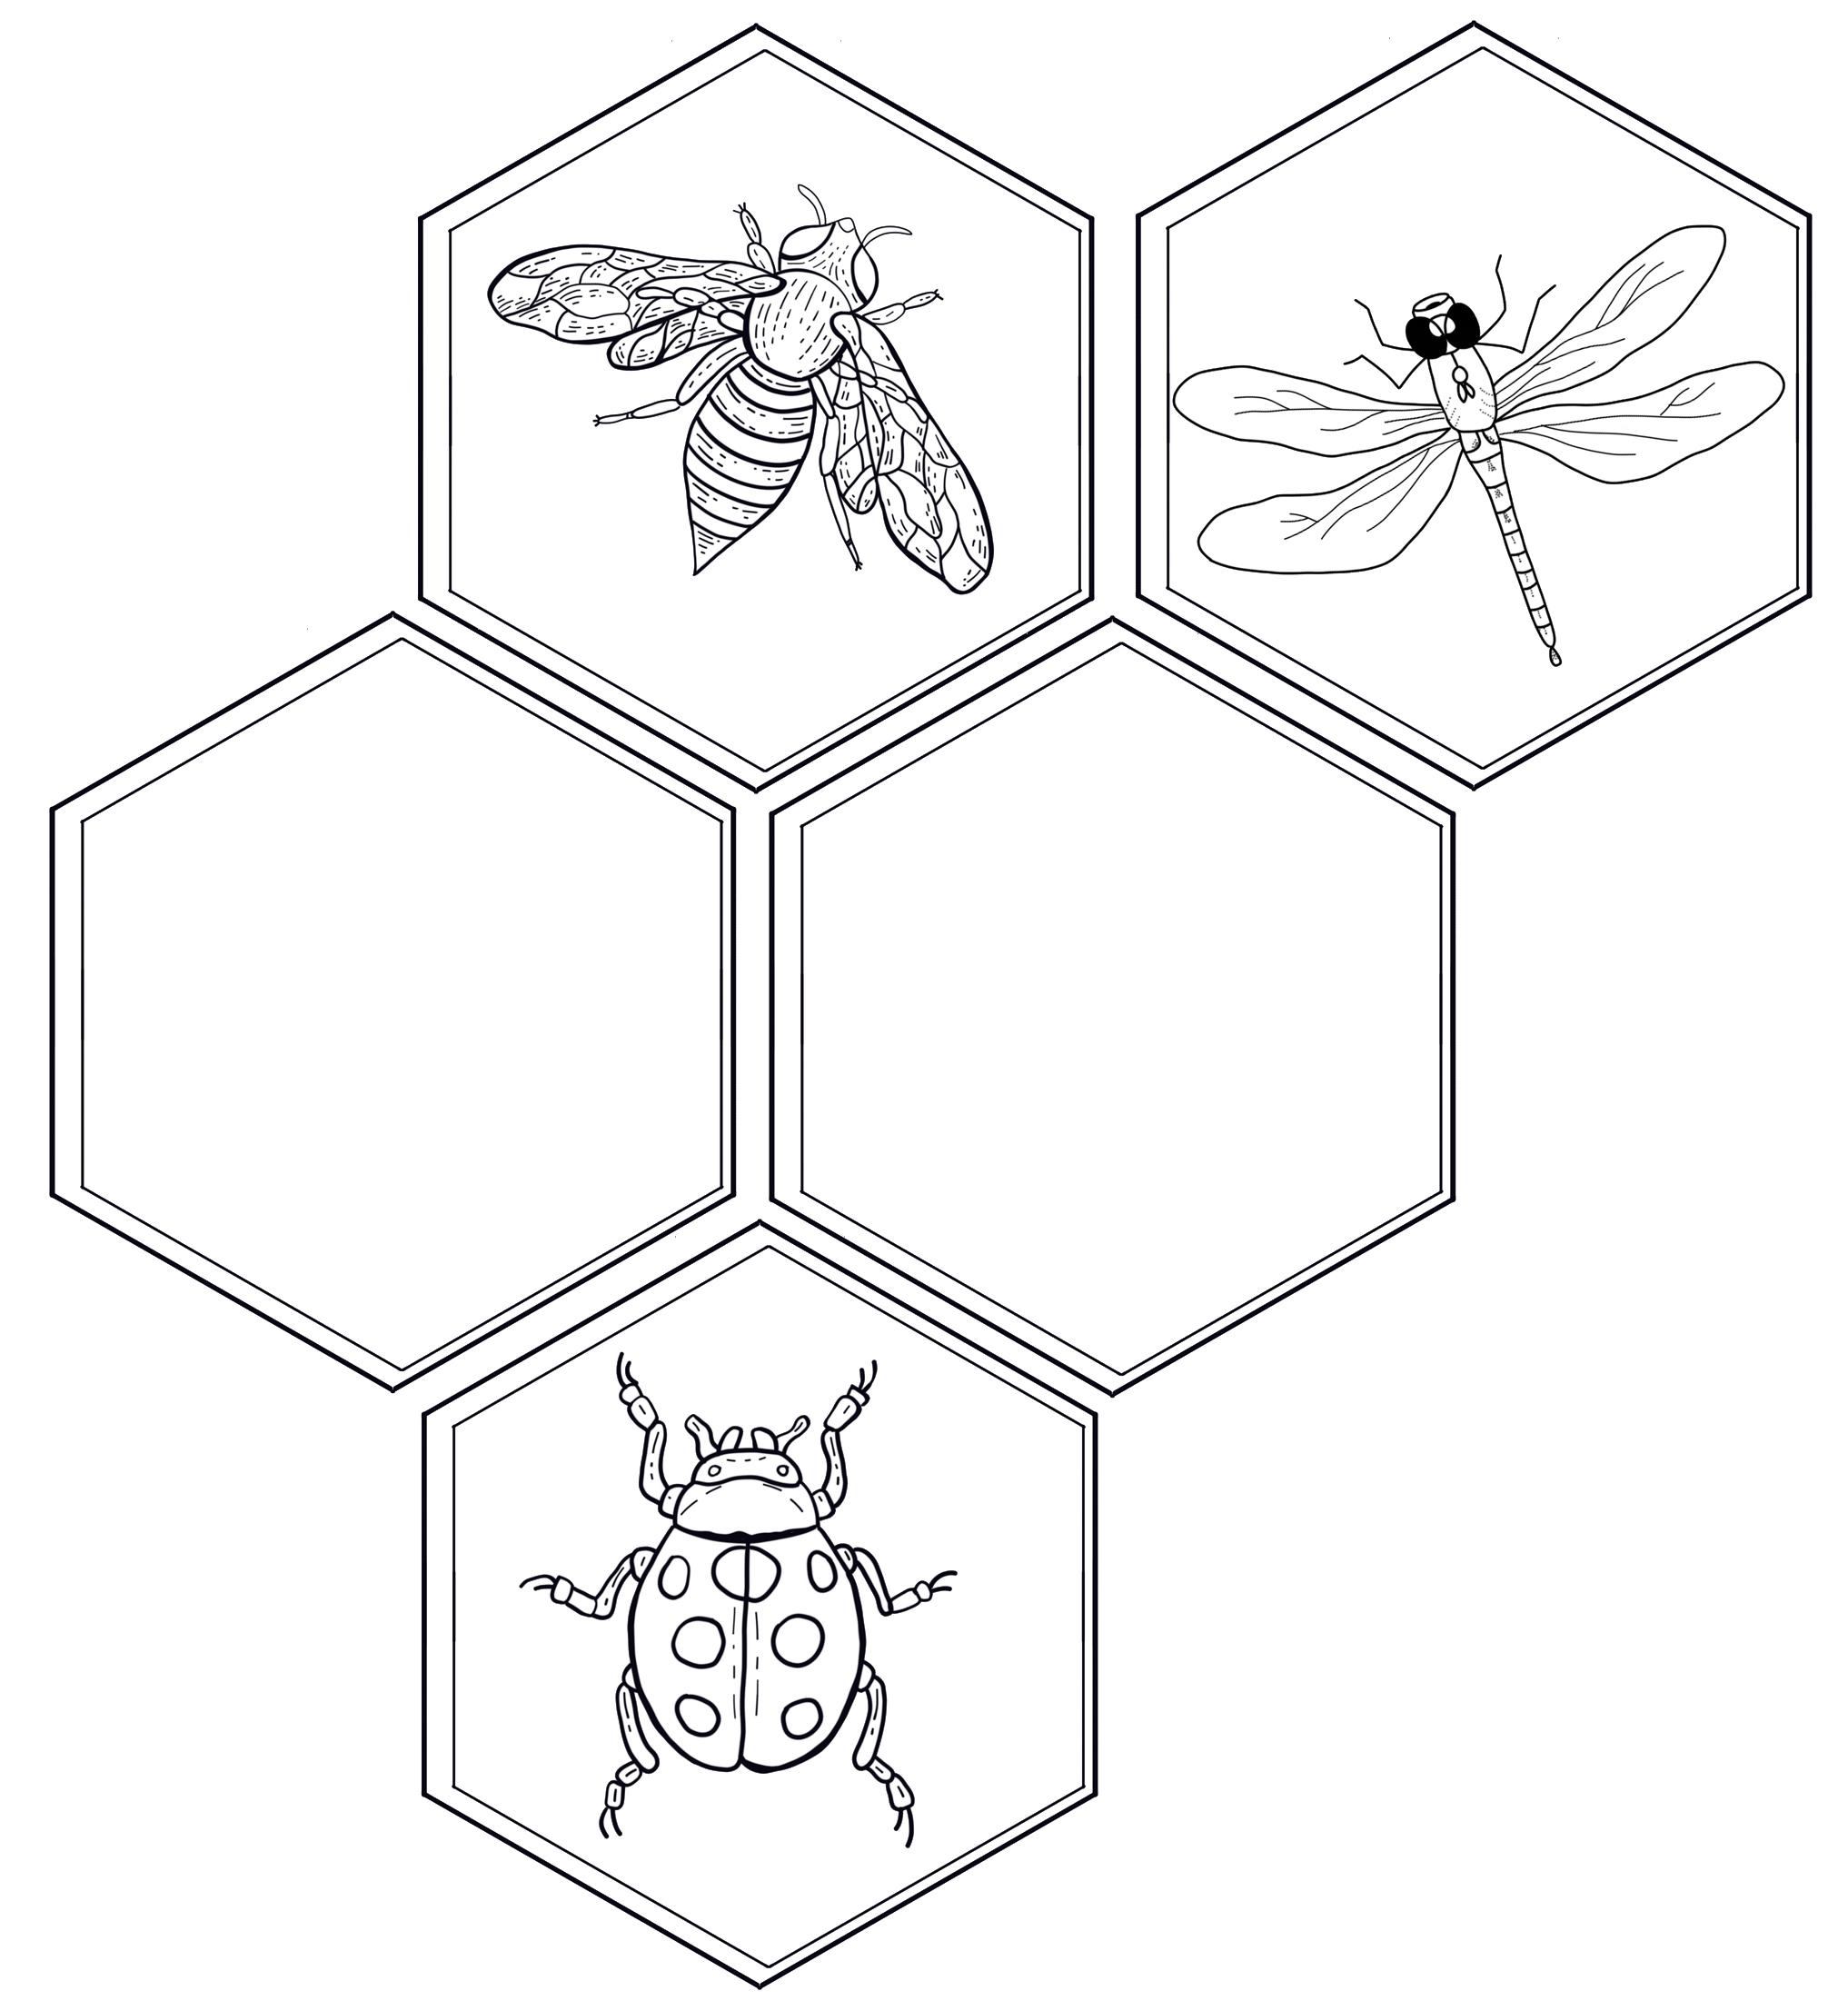 Honeycomb with animals